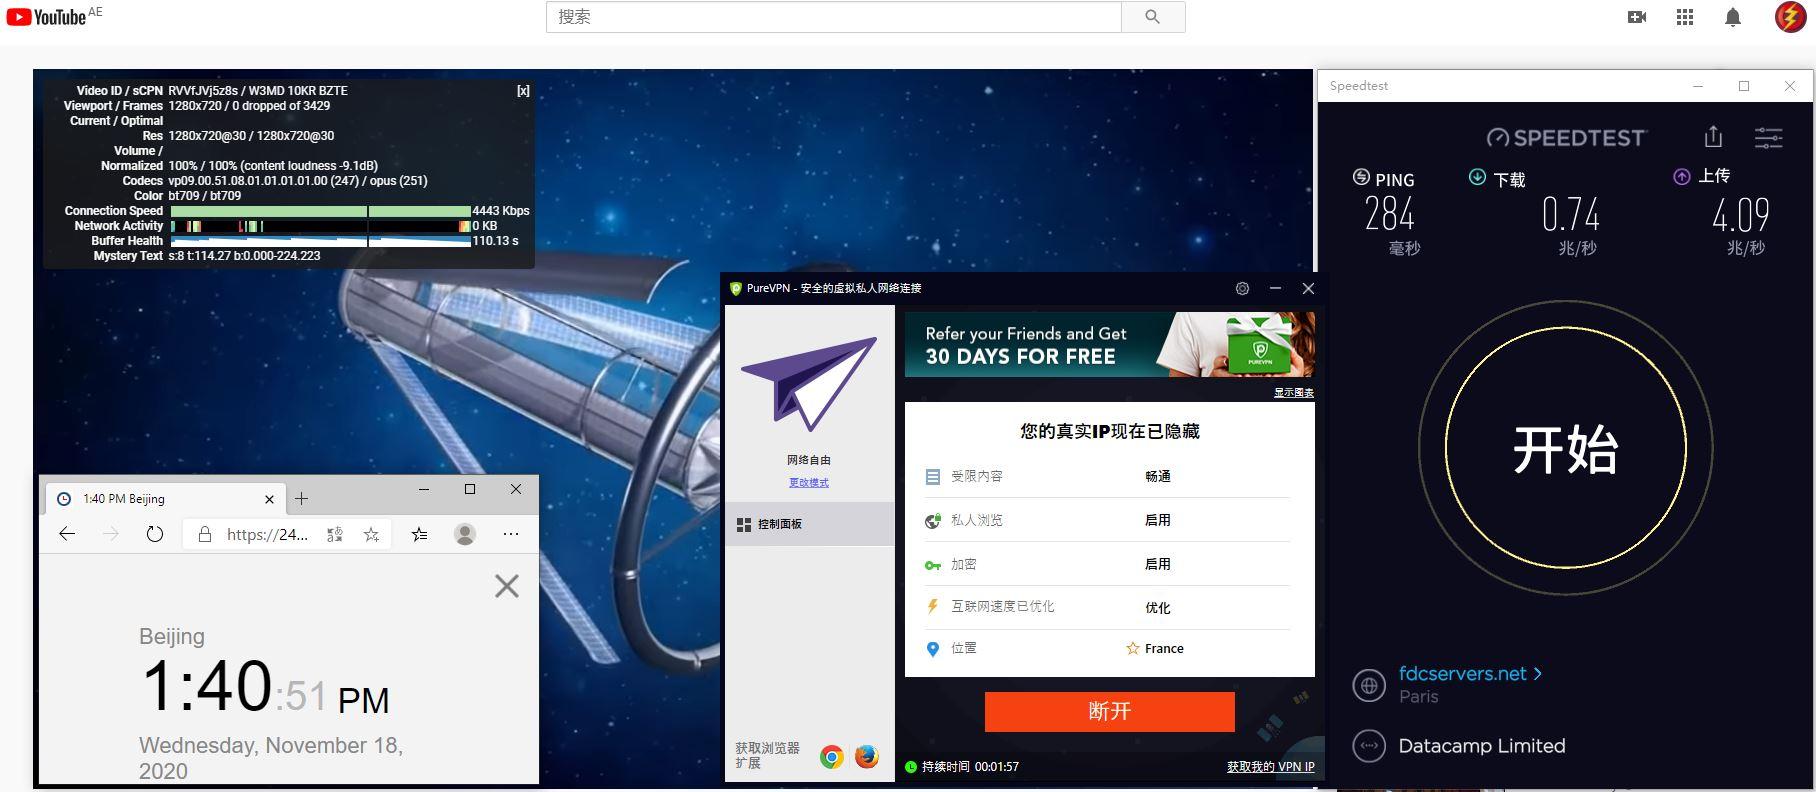 Windows10 PureVPN France 服务器 中国VPN 翻墙 科学上网 测试 - 20201118